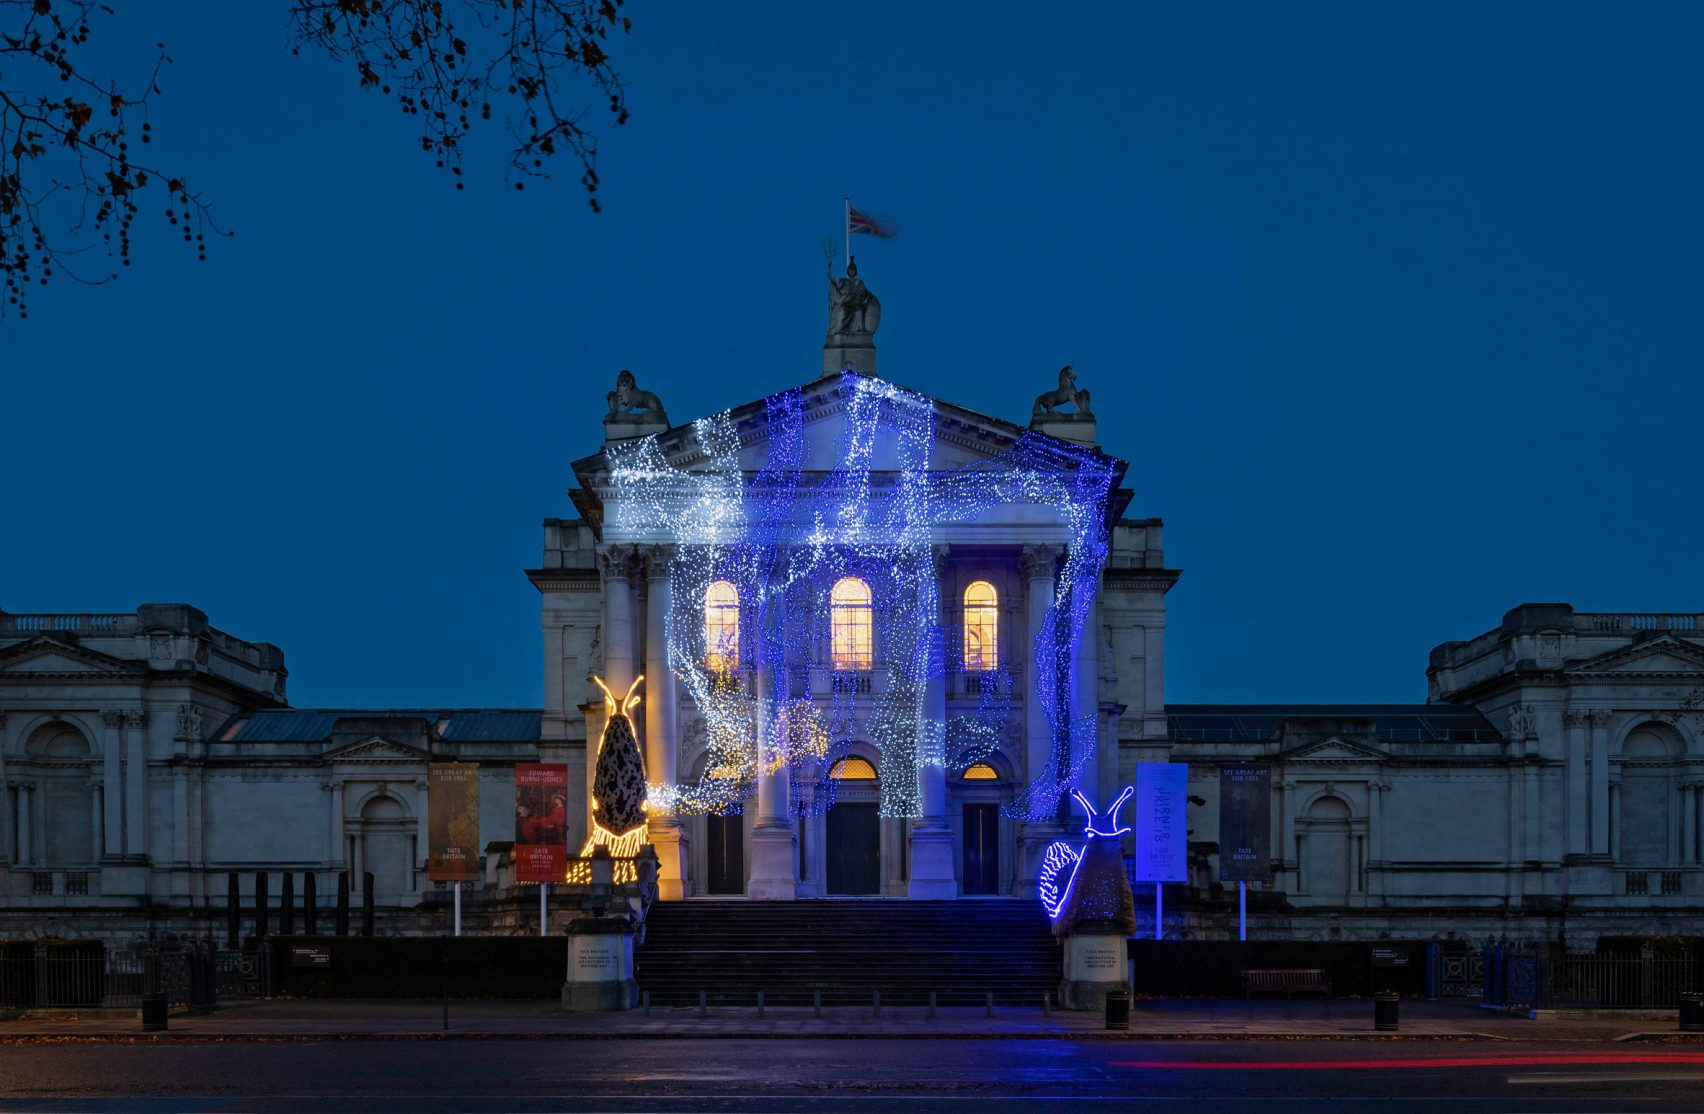 слизняки в искусстве слизнями, светящимися, гигантскими, украшен, Britain